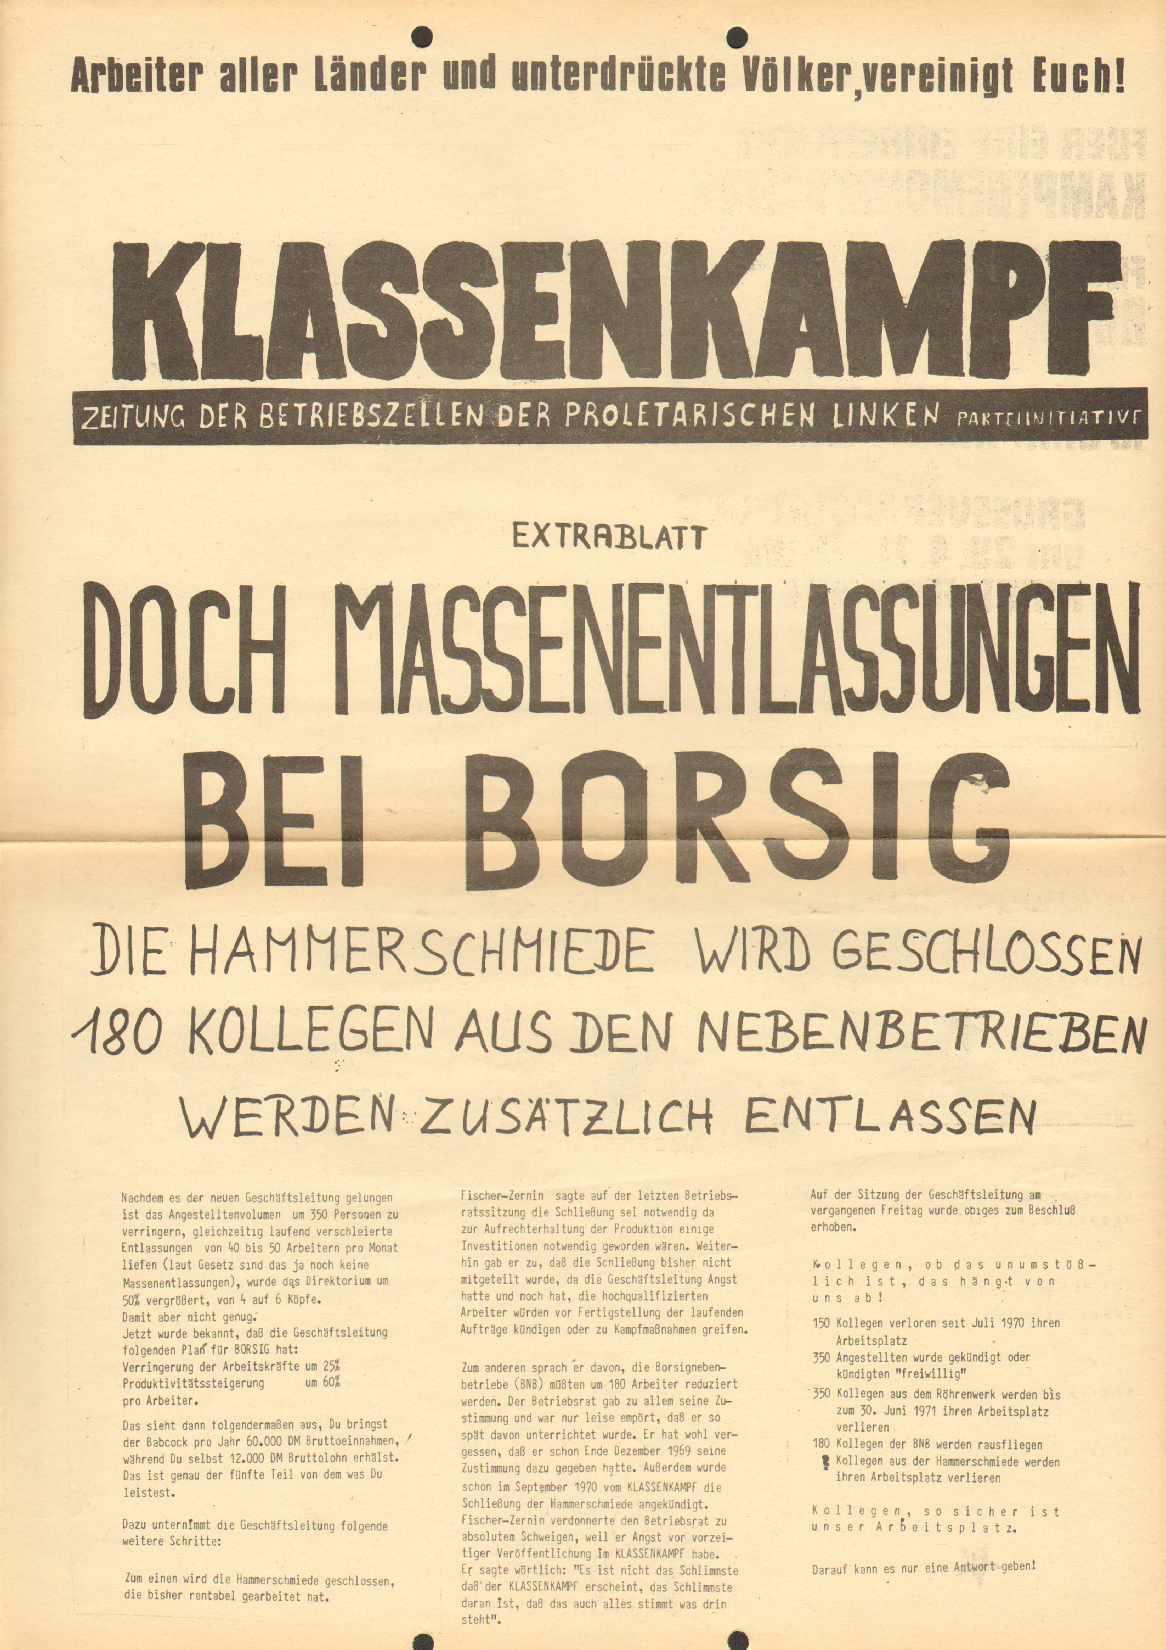 Berlin_Borsig018